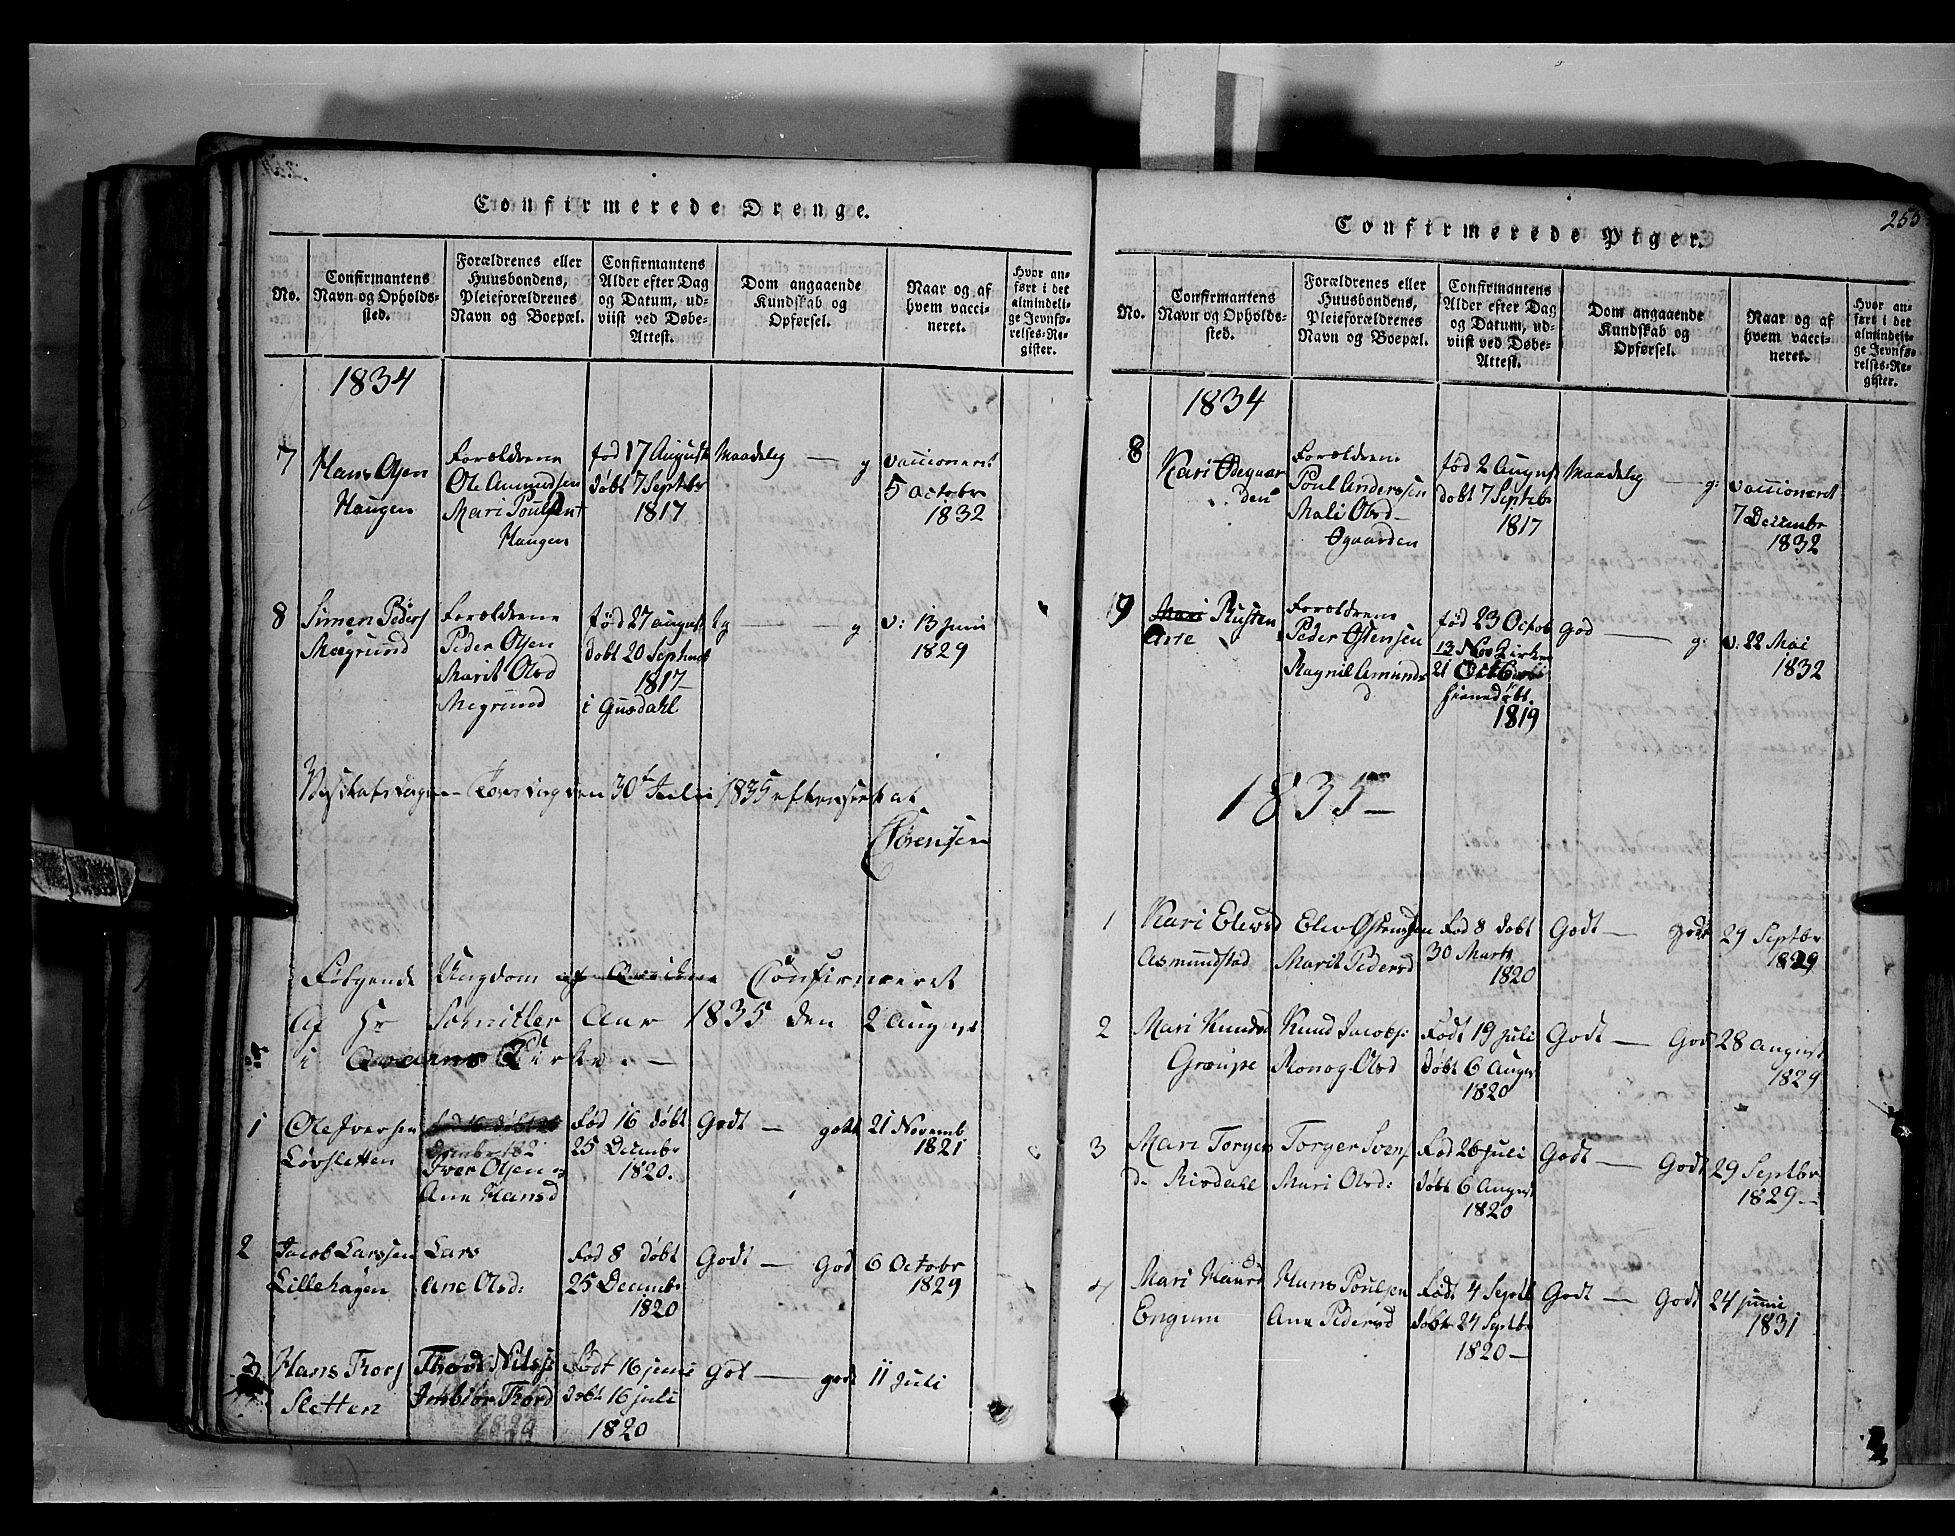 SAH, Fron prestekontor, H/Ha/Hab/L0003: Klokkerbok nr. 3, 1816-1850, s. 255